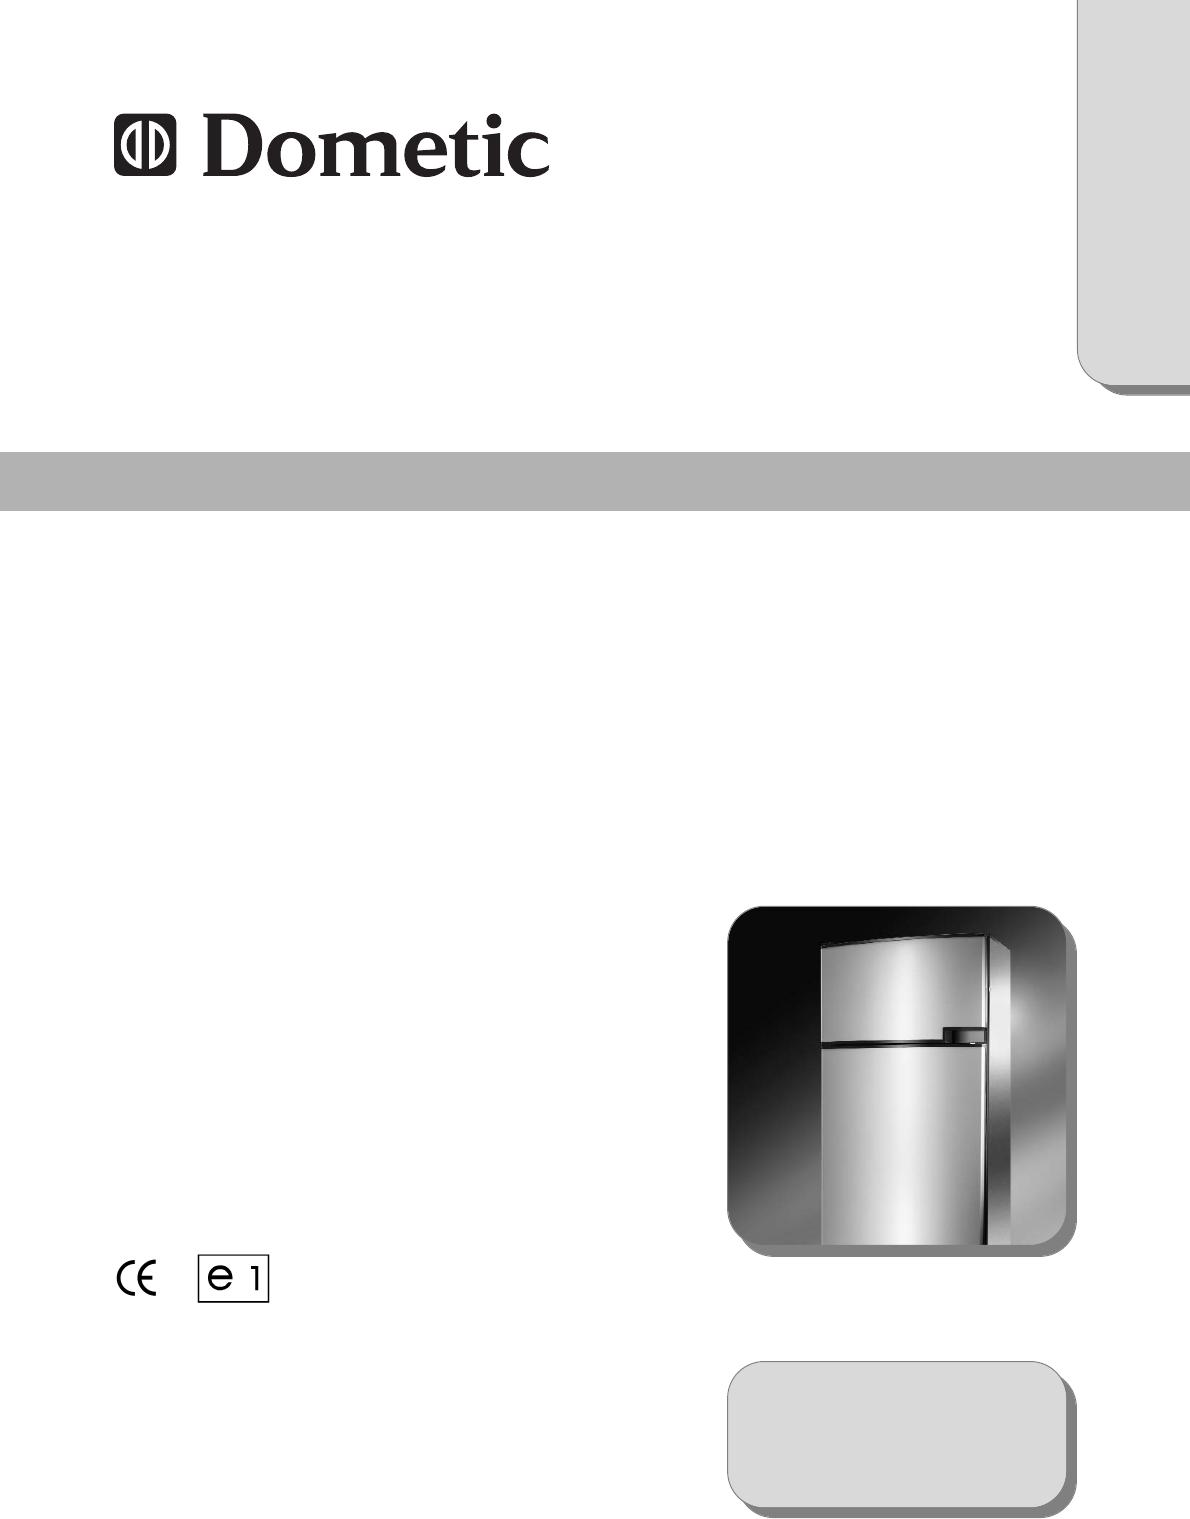 handleiding dometic rmd 8505 pagina 1 van 120 deutsch. Black Bedroom Furniture Sets. Home Design Ideas